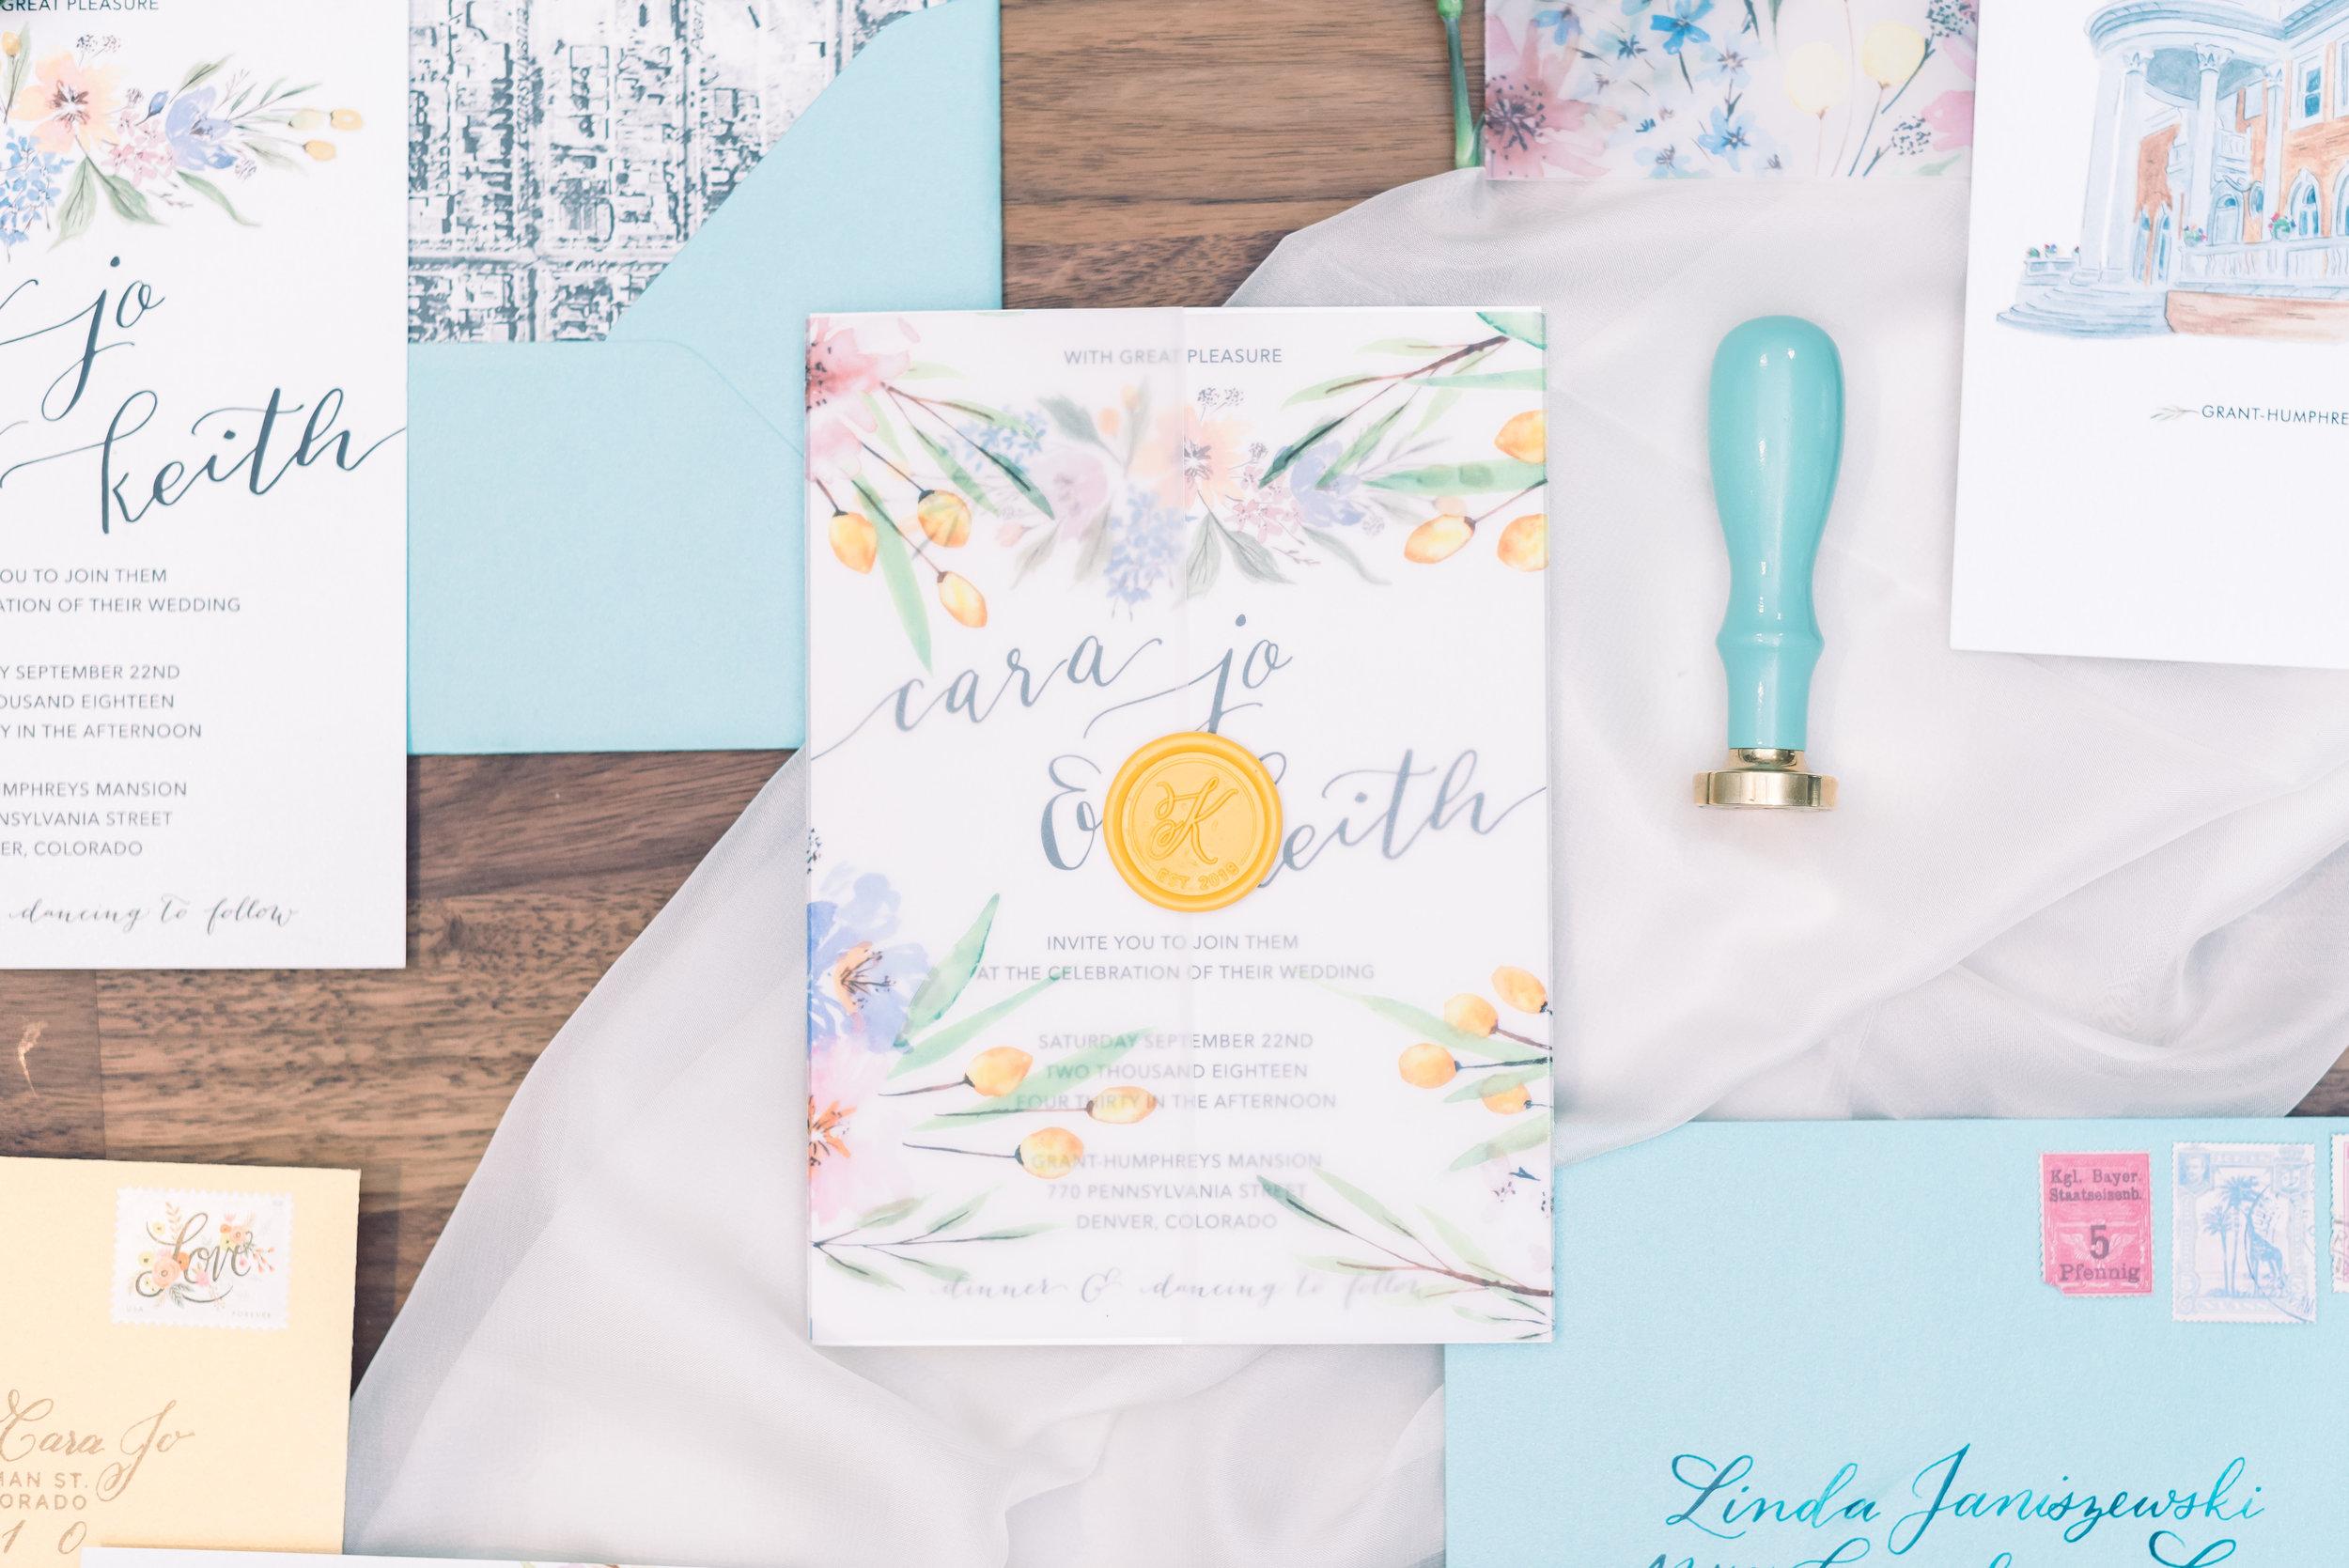 Watercolor Floral invitation suite with vellum wrap